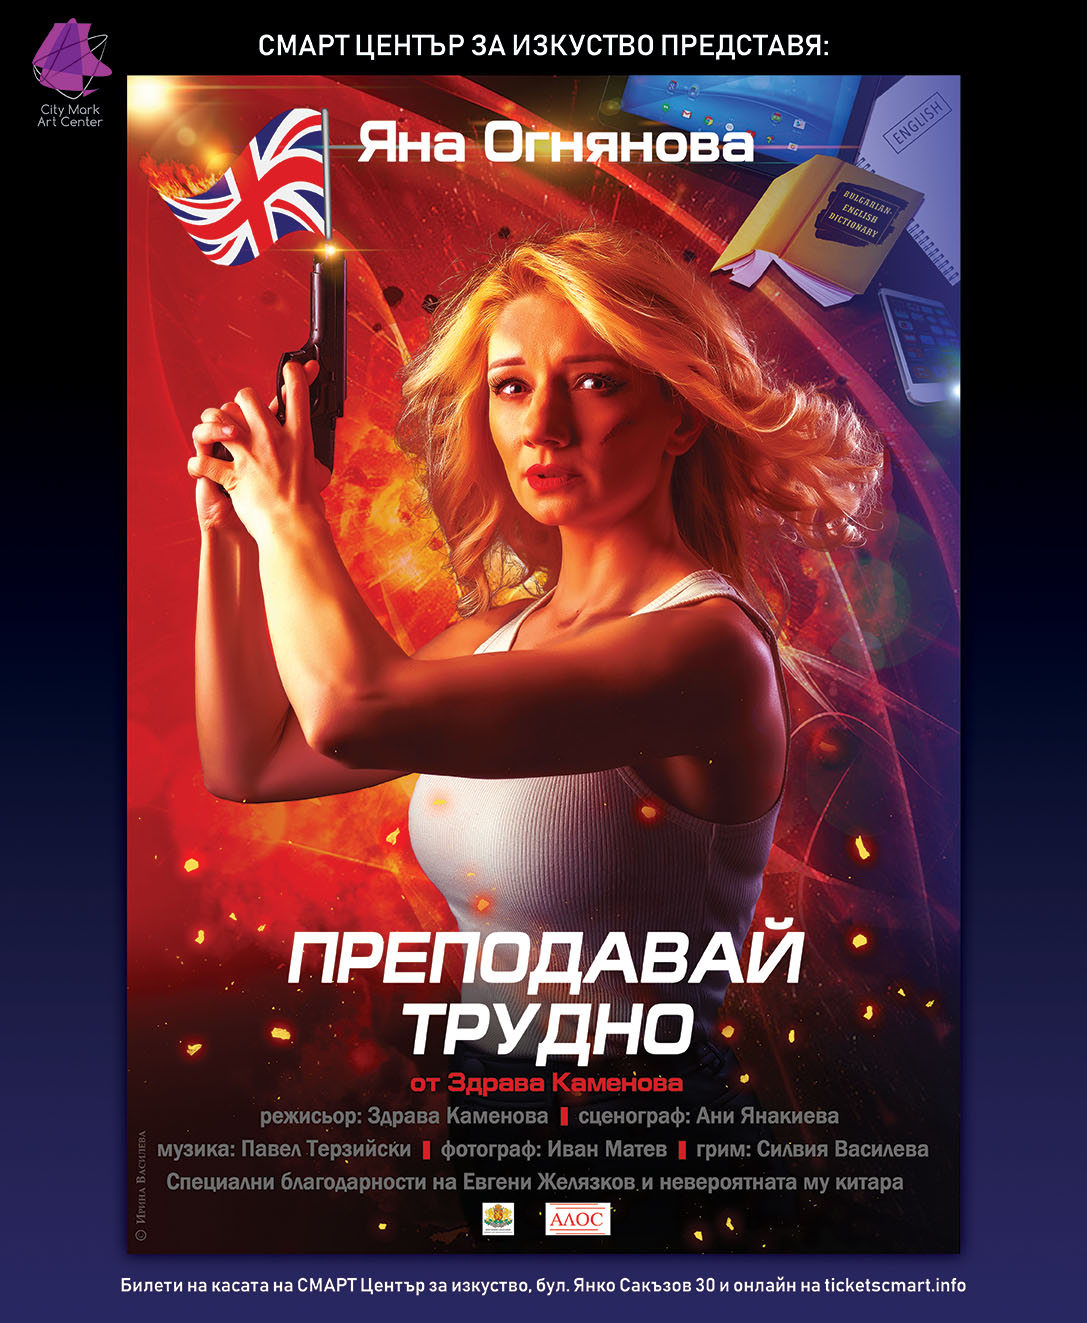 CMAC_PrepodavayTrudno_Poster_92x112cm